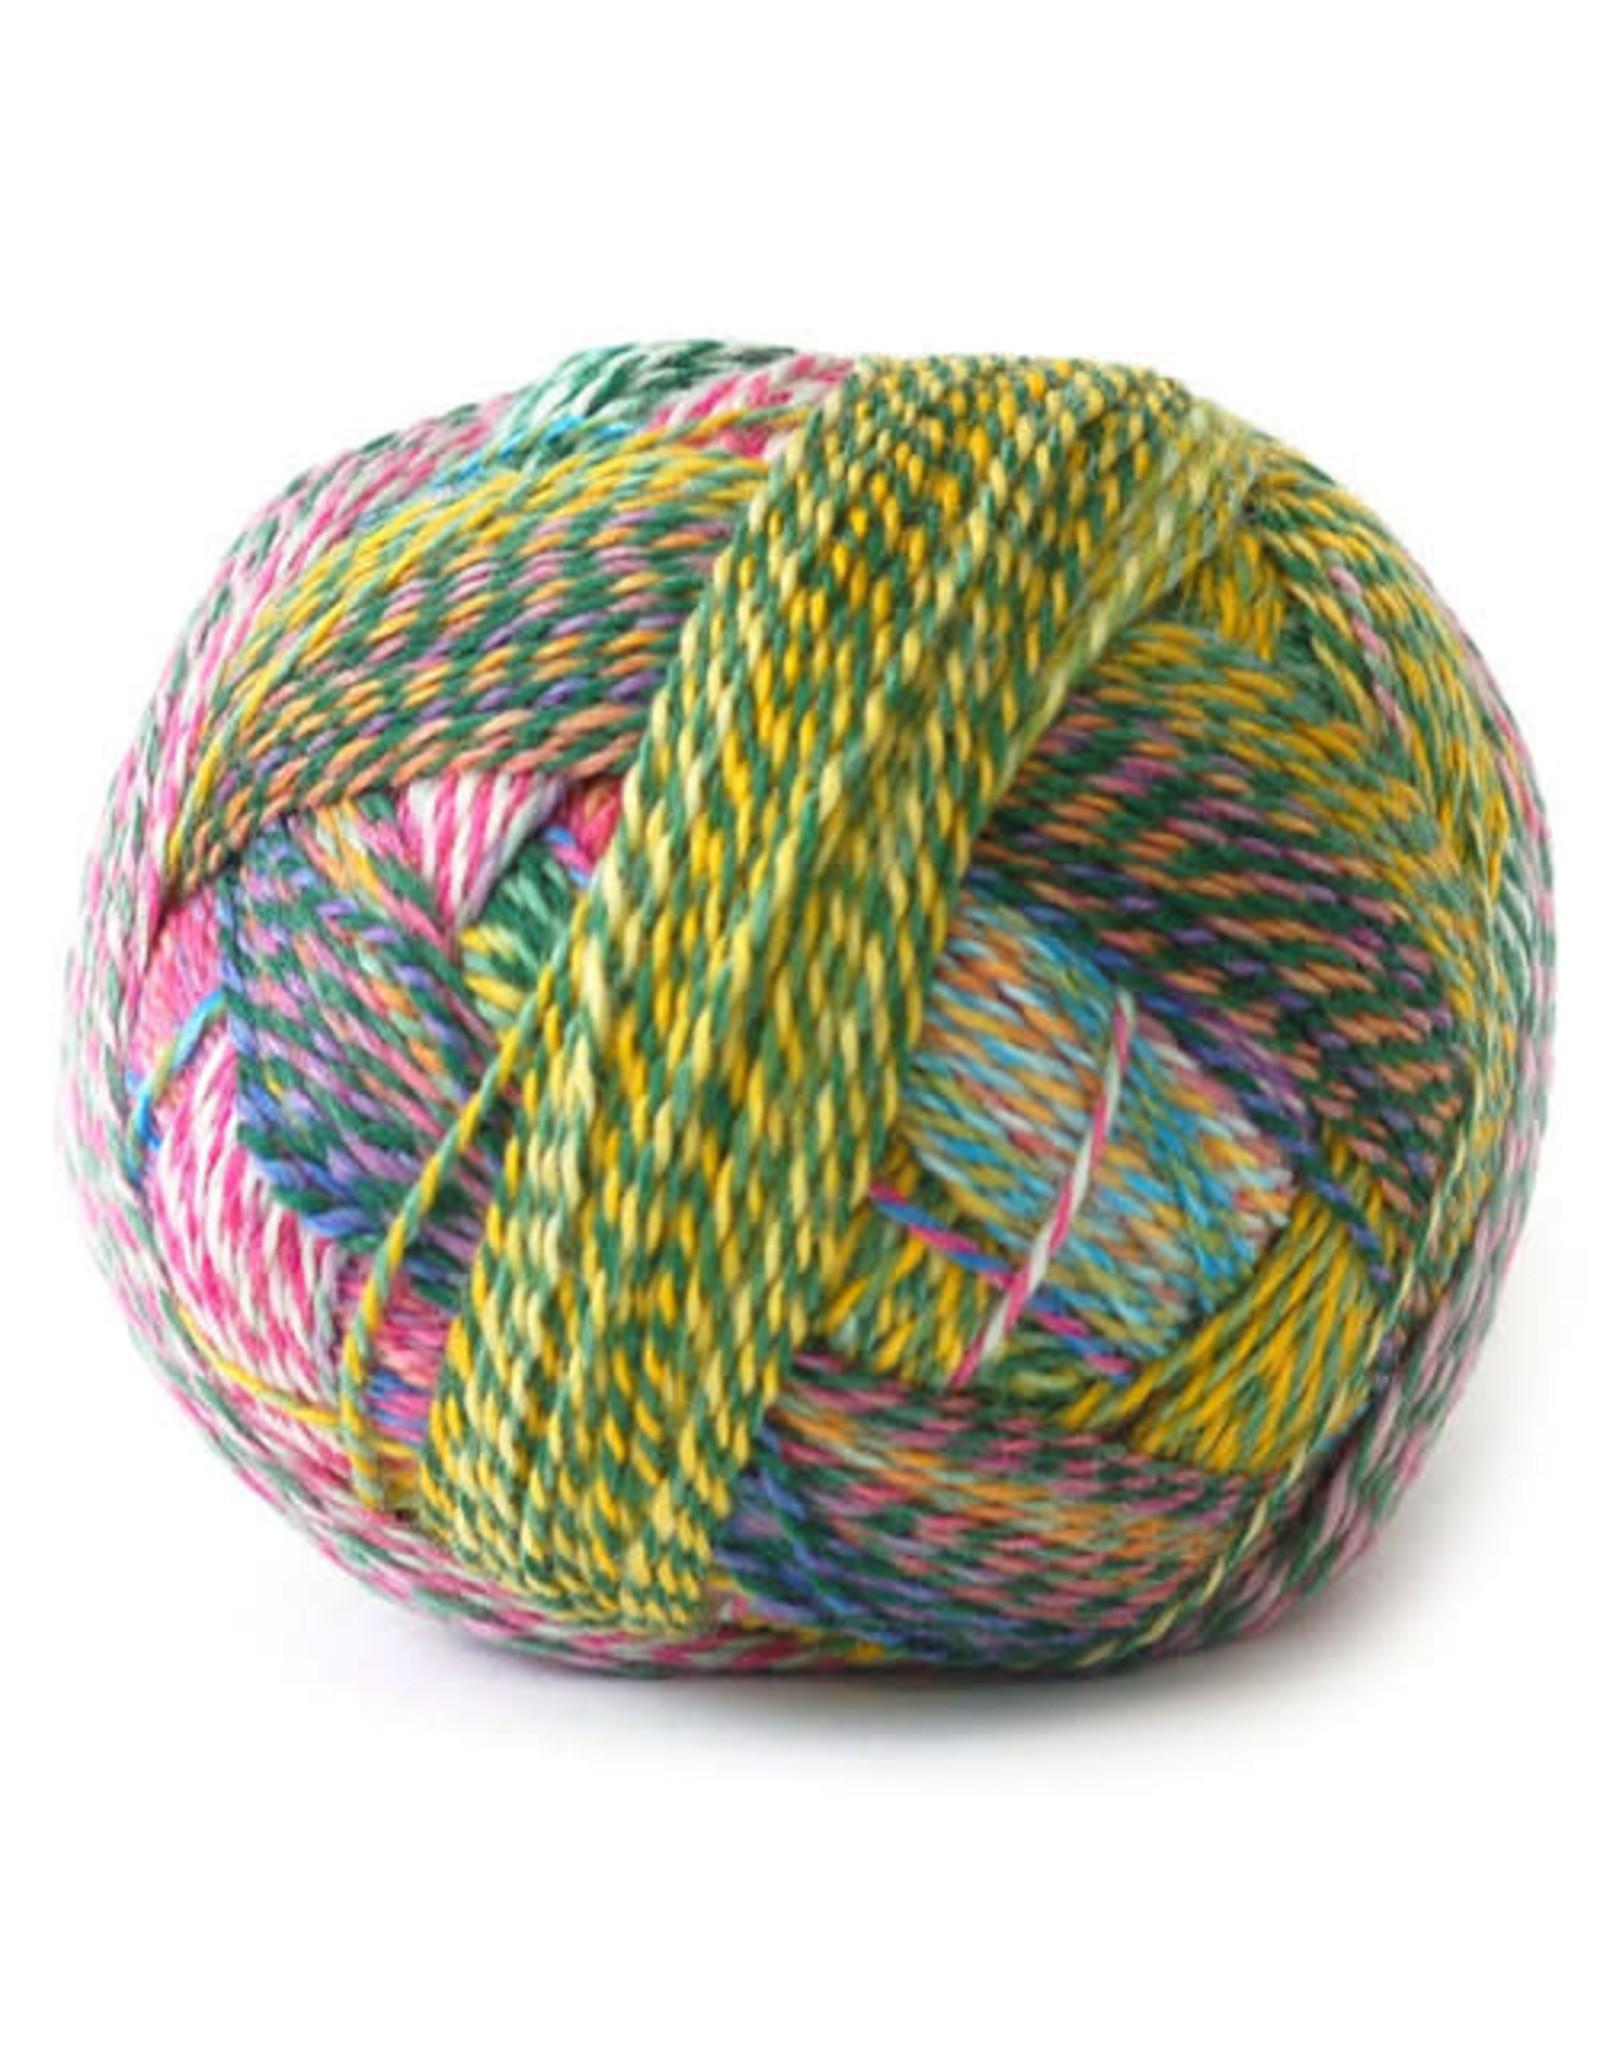 Scoppel-Wolle 2334 - Zauberball Crazy - Schoppel Wolle